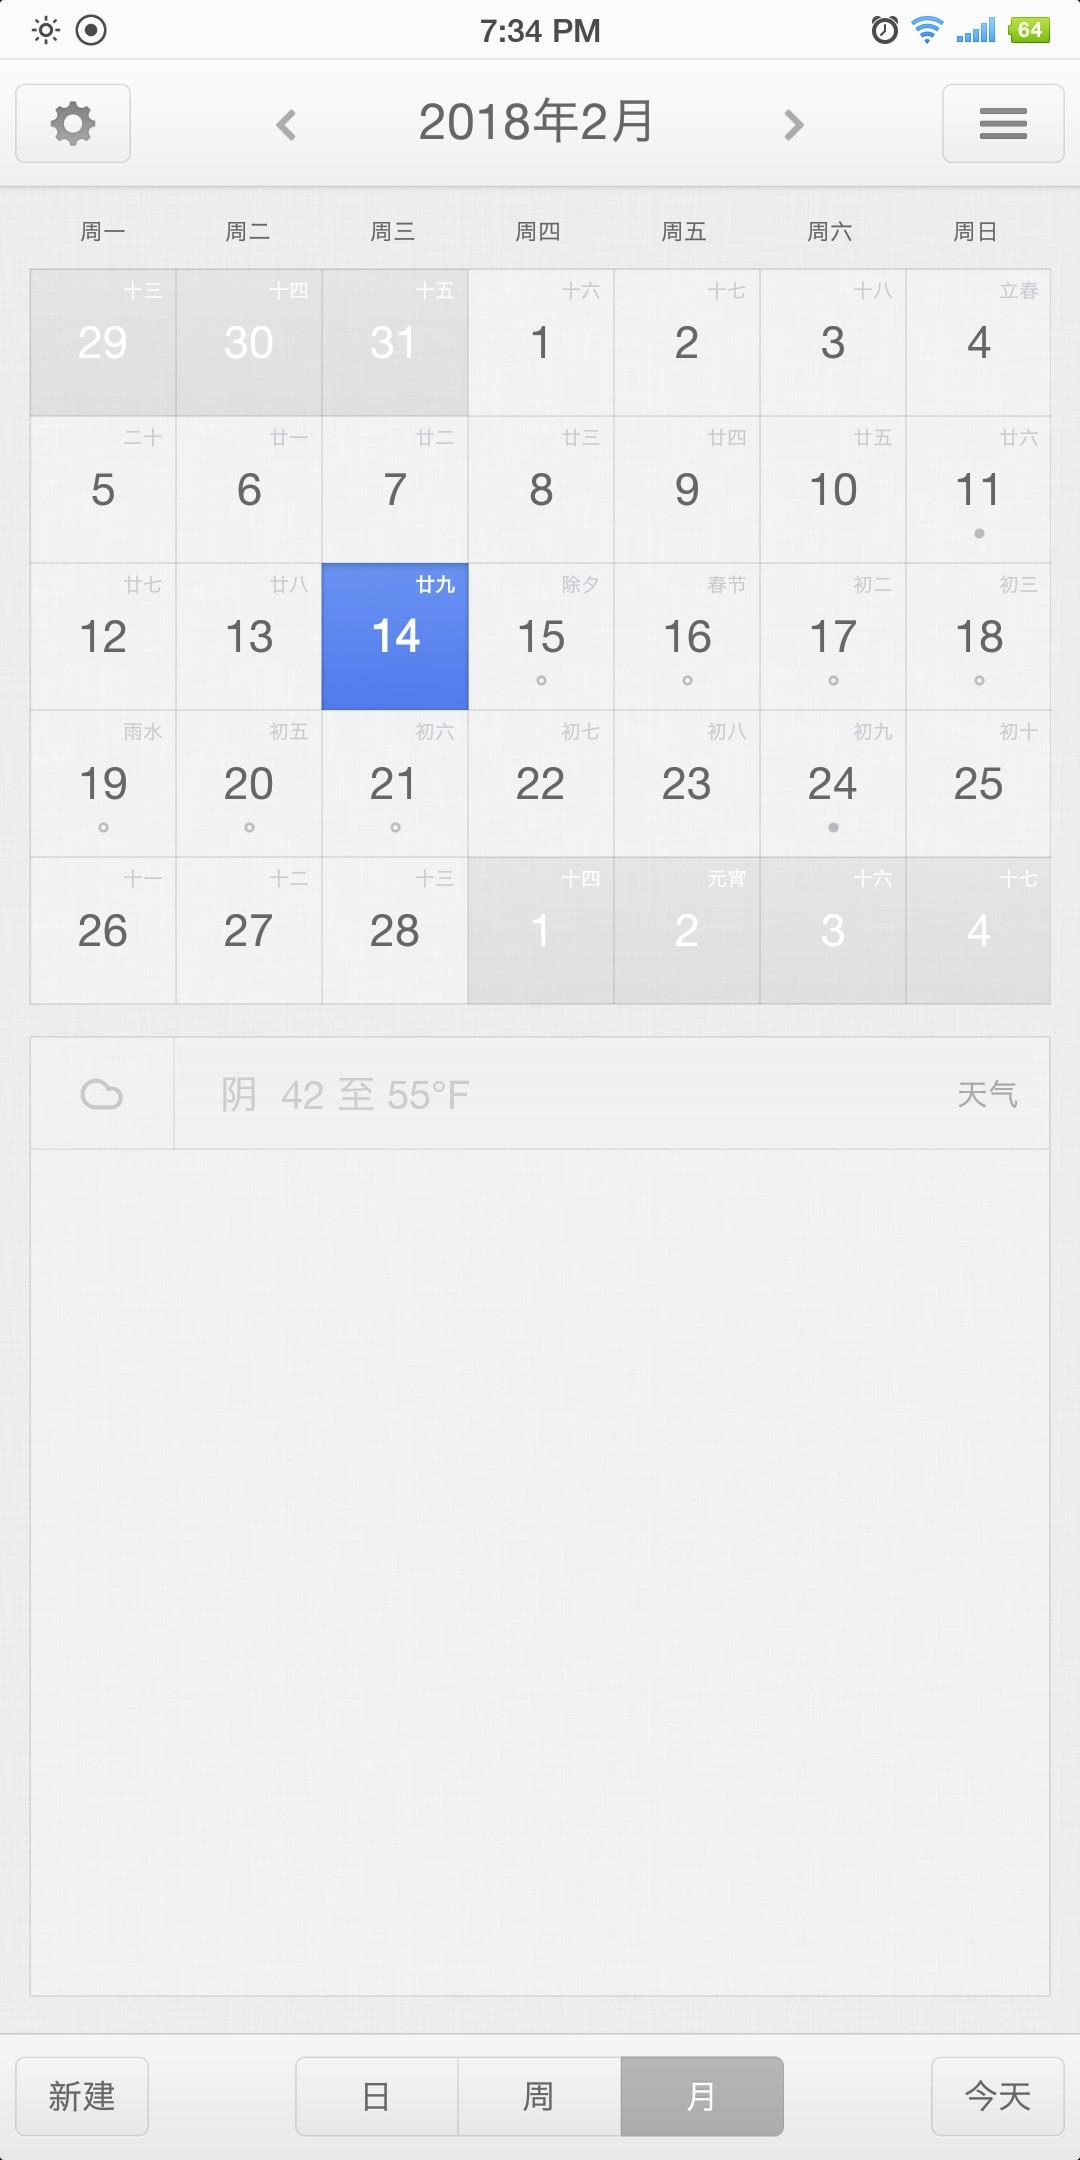 Screenshot_2018-02-14-19-34-21-755_??.png